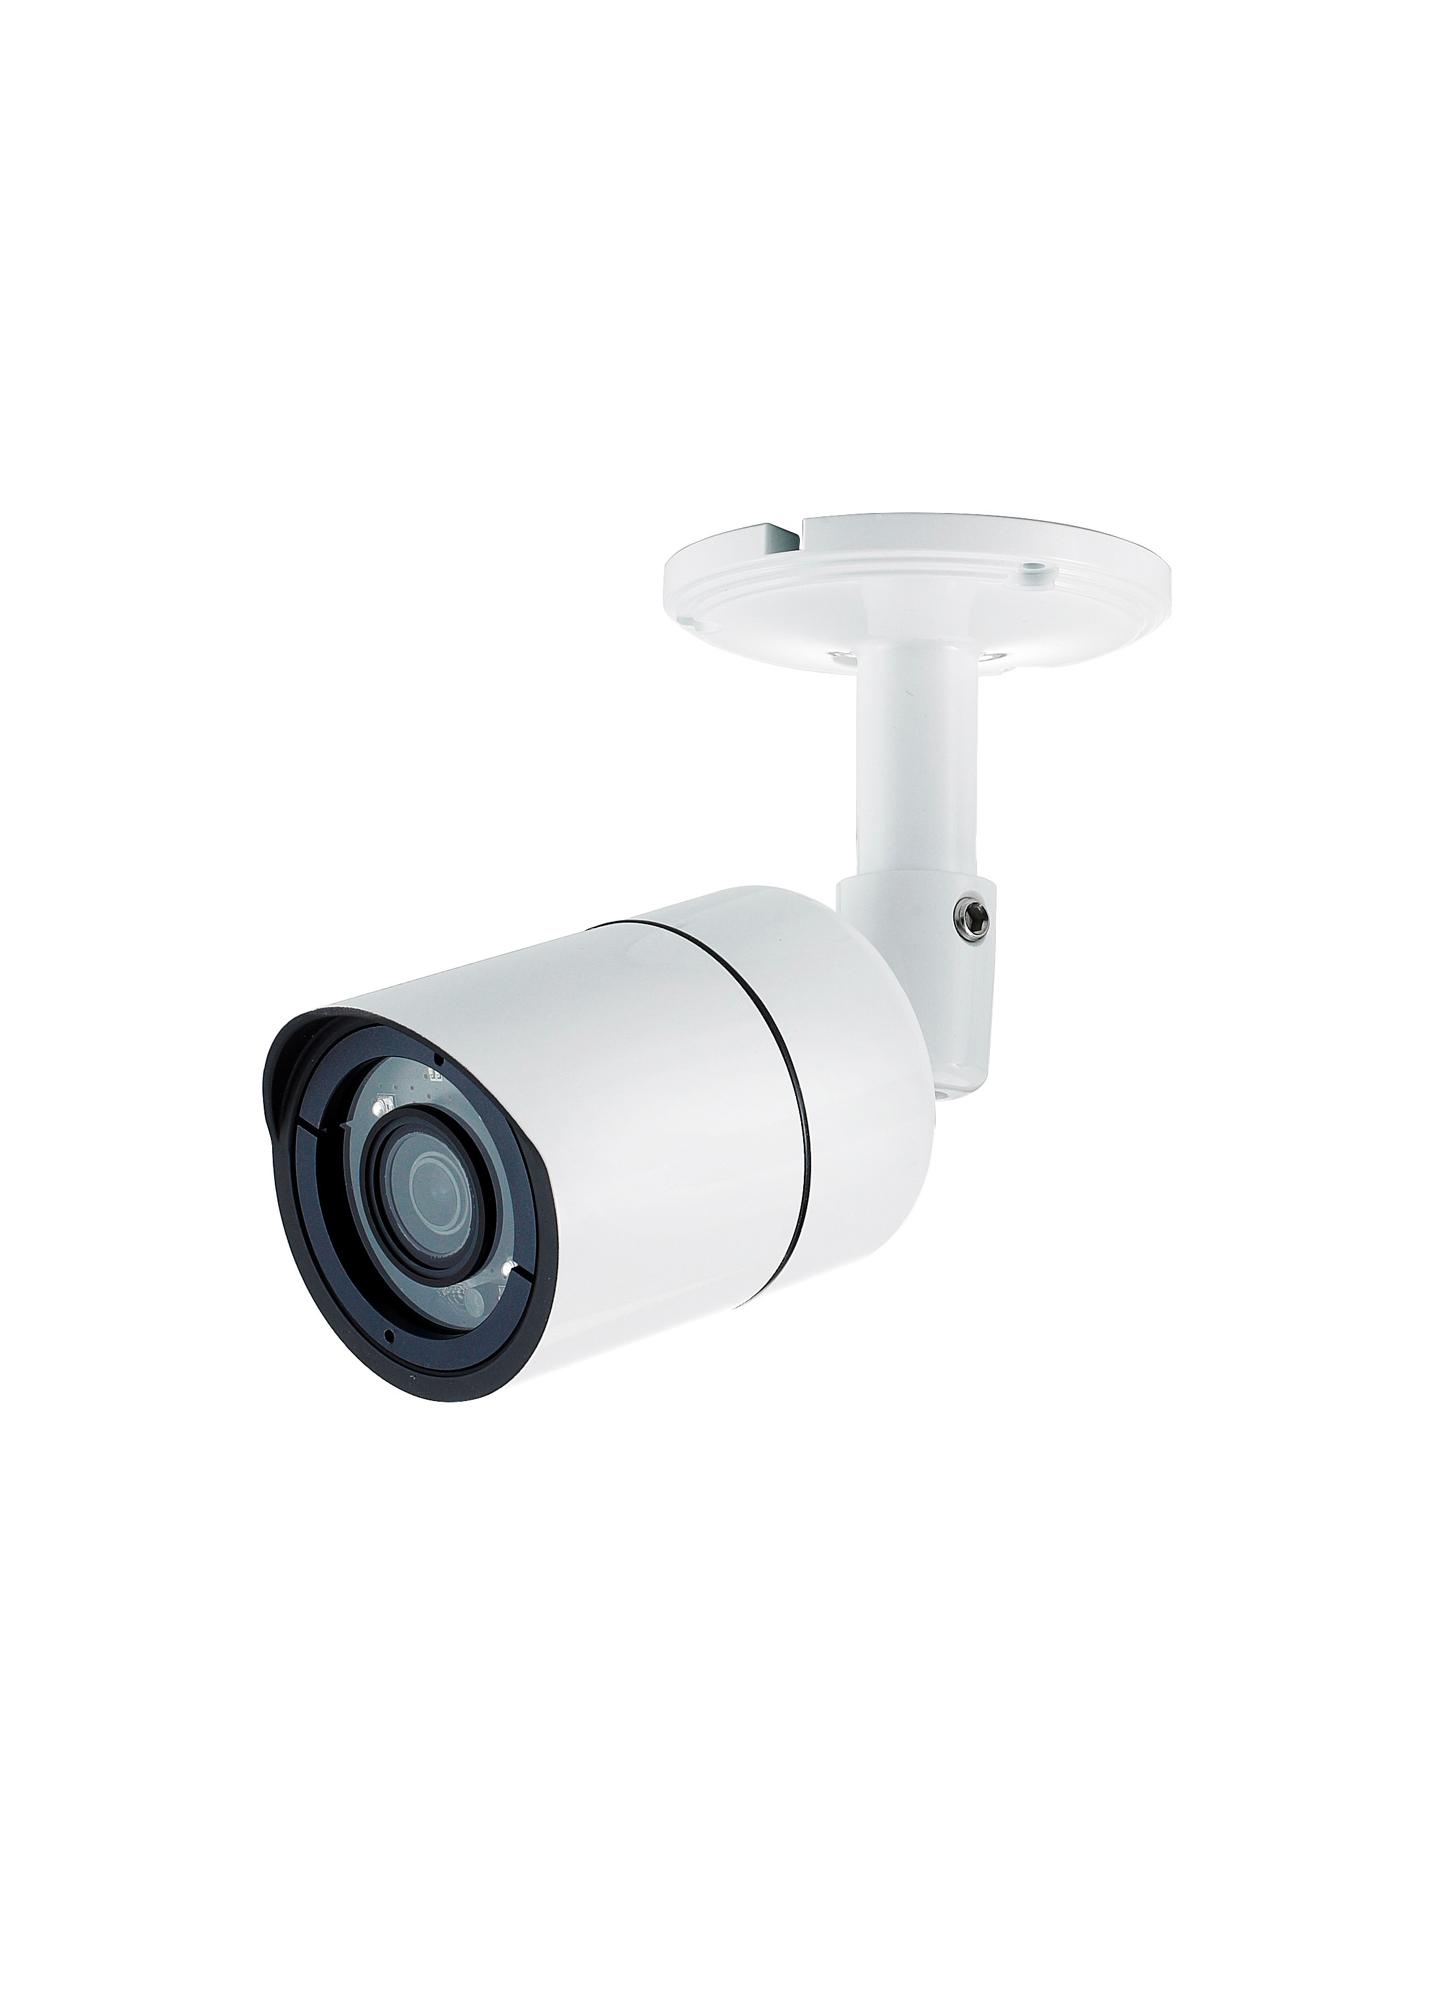 A range of CSP marine camera